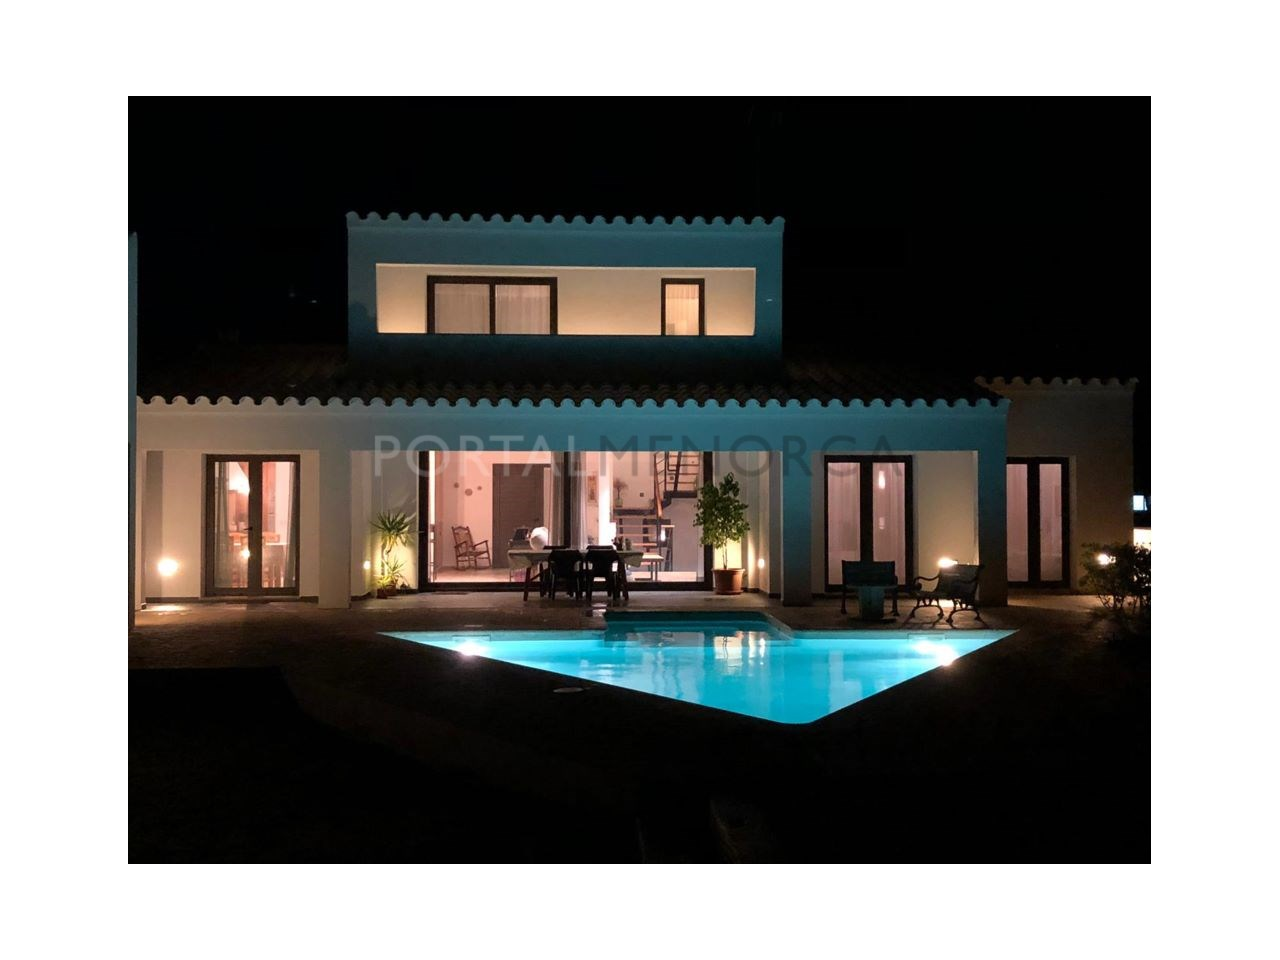 Chalet à vendre à Cala Morell, Ciutadella- Façade de nuit